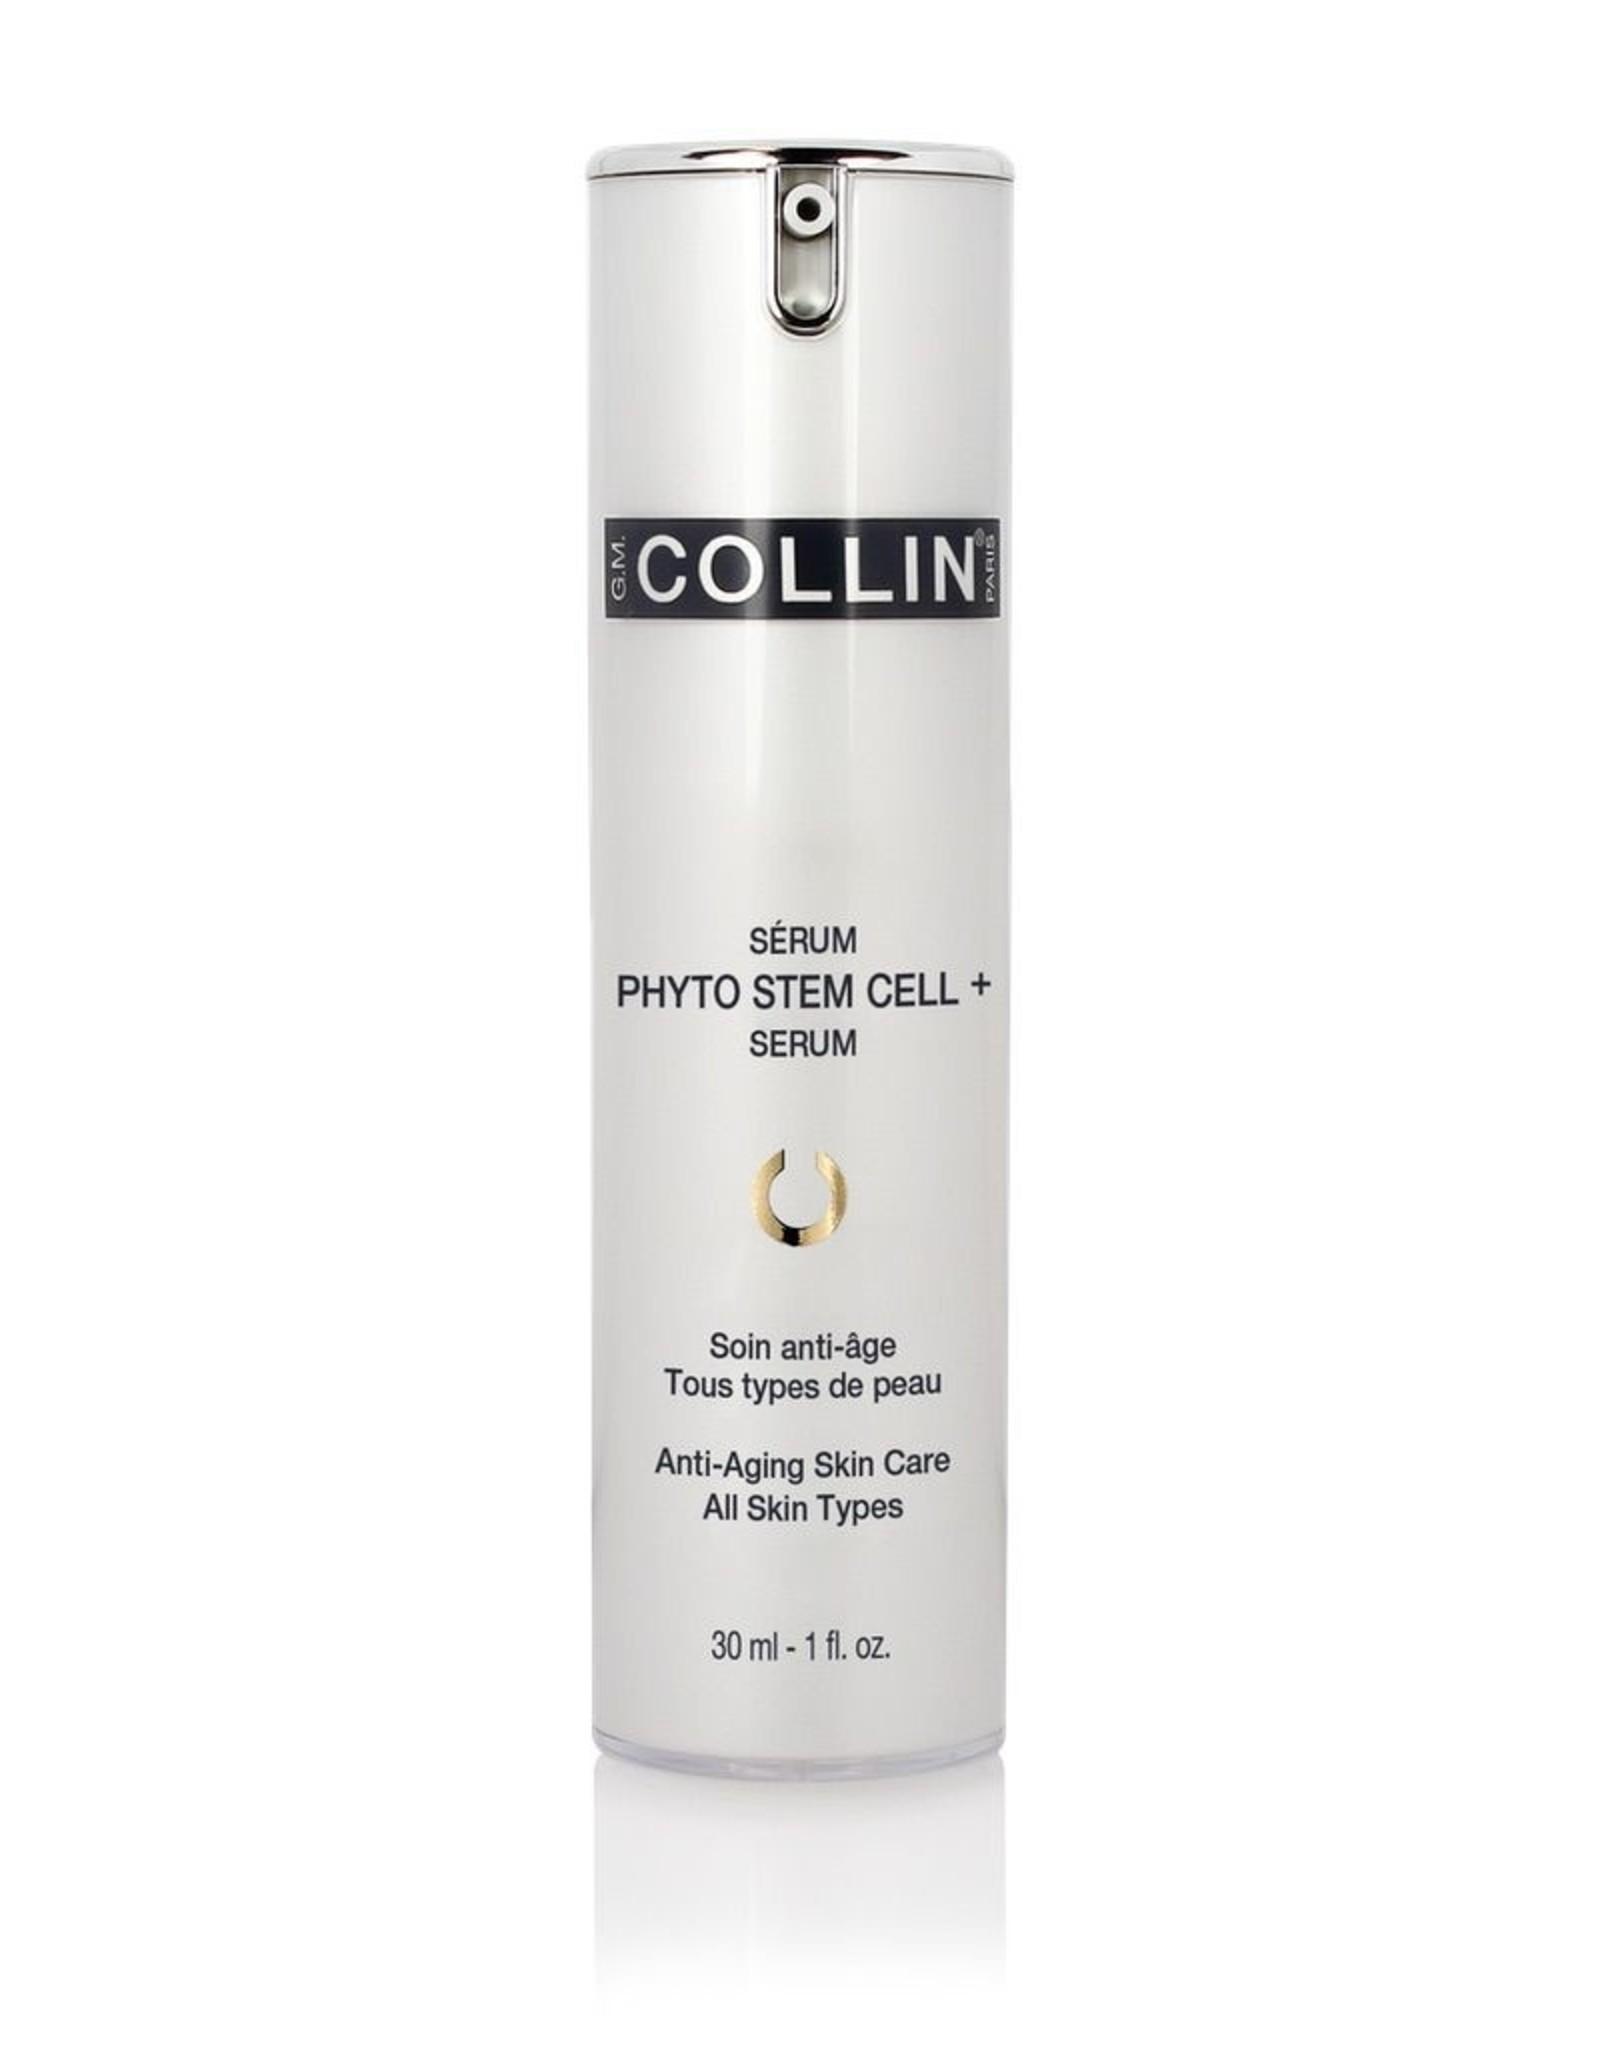 GM Collin G.M. Collin Phyto Stem Cell+ Serum, 30ml